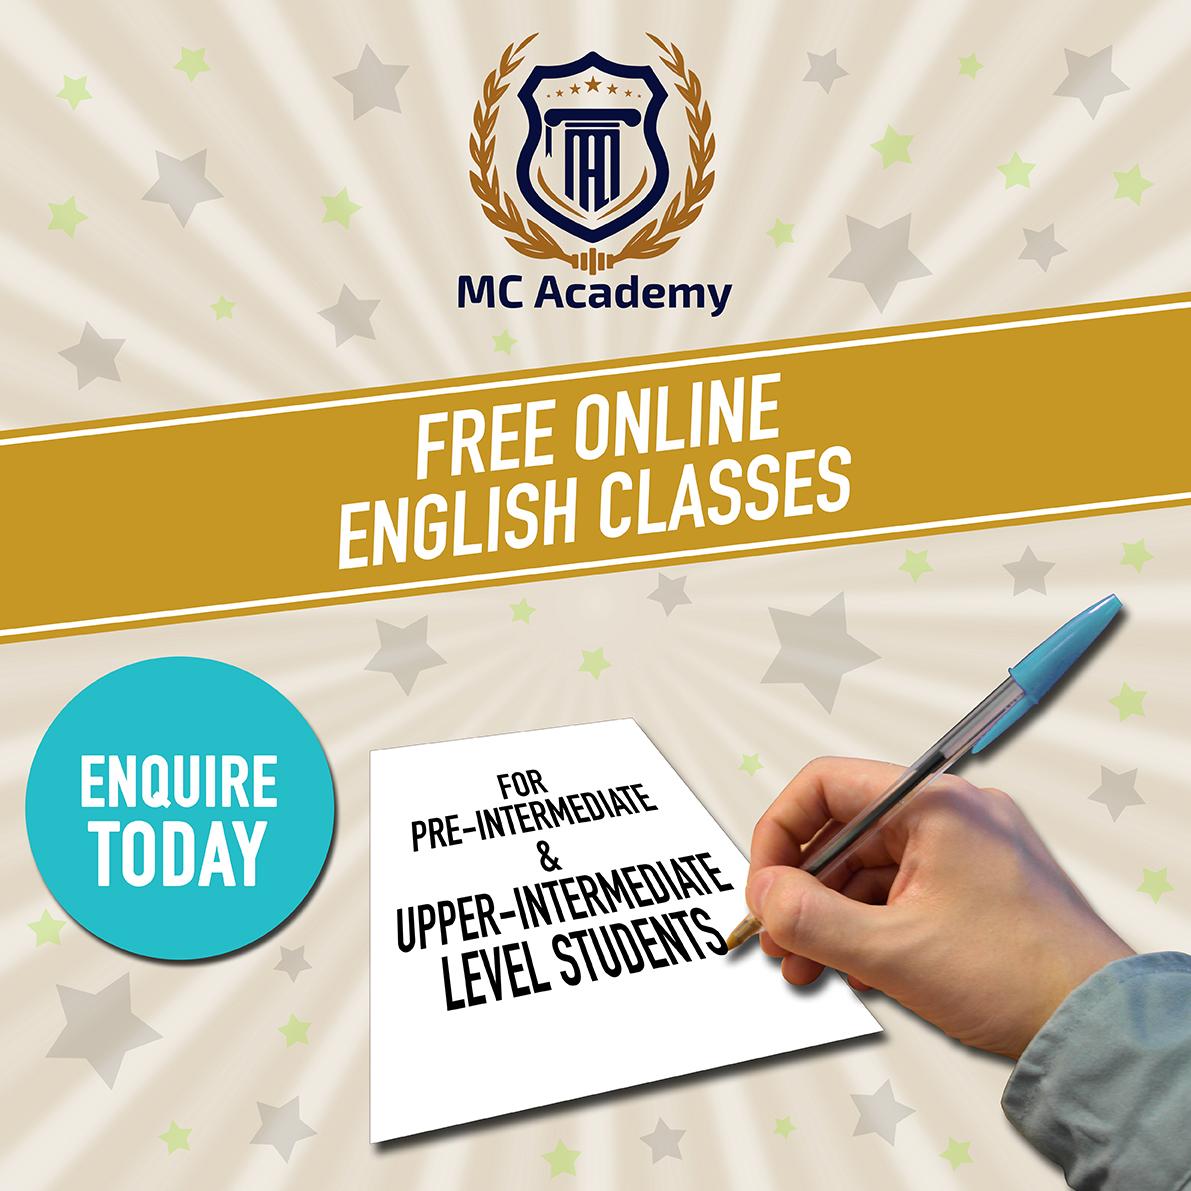 Free Online English Classes